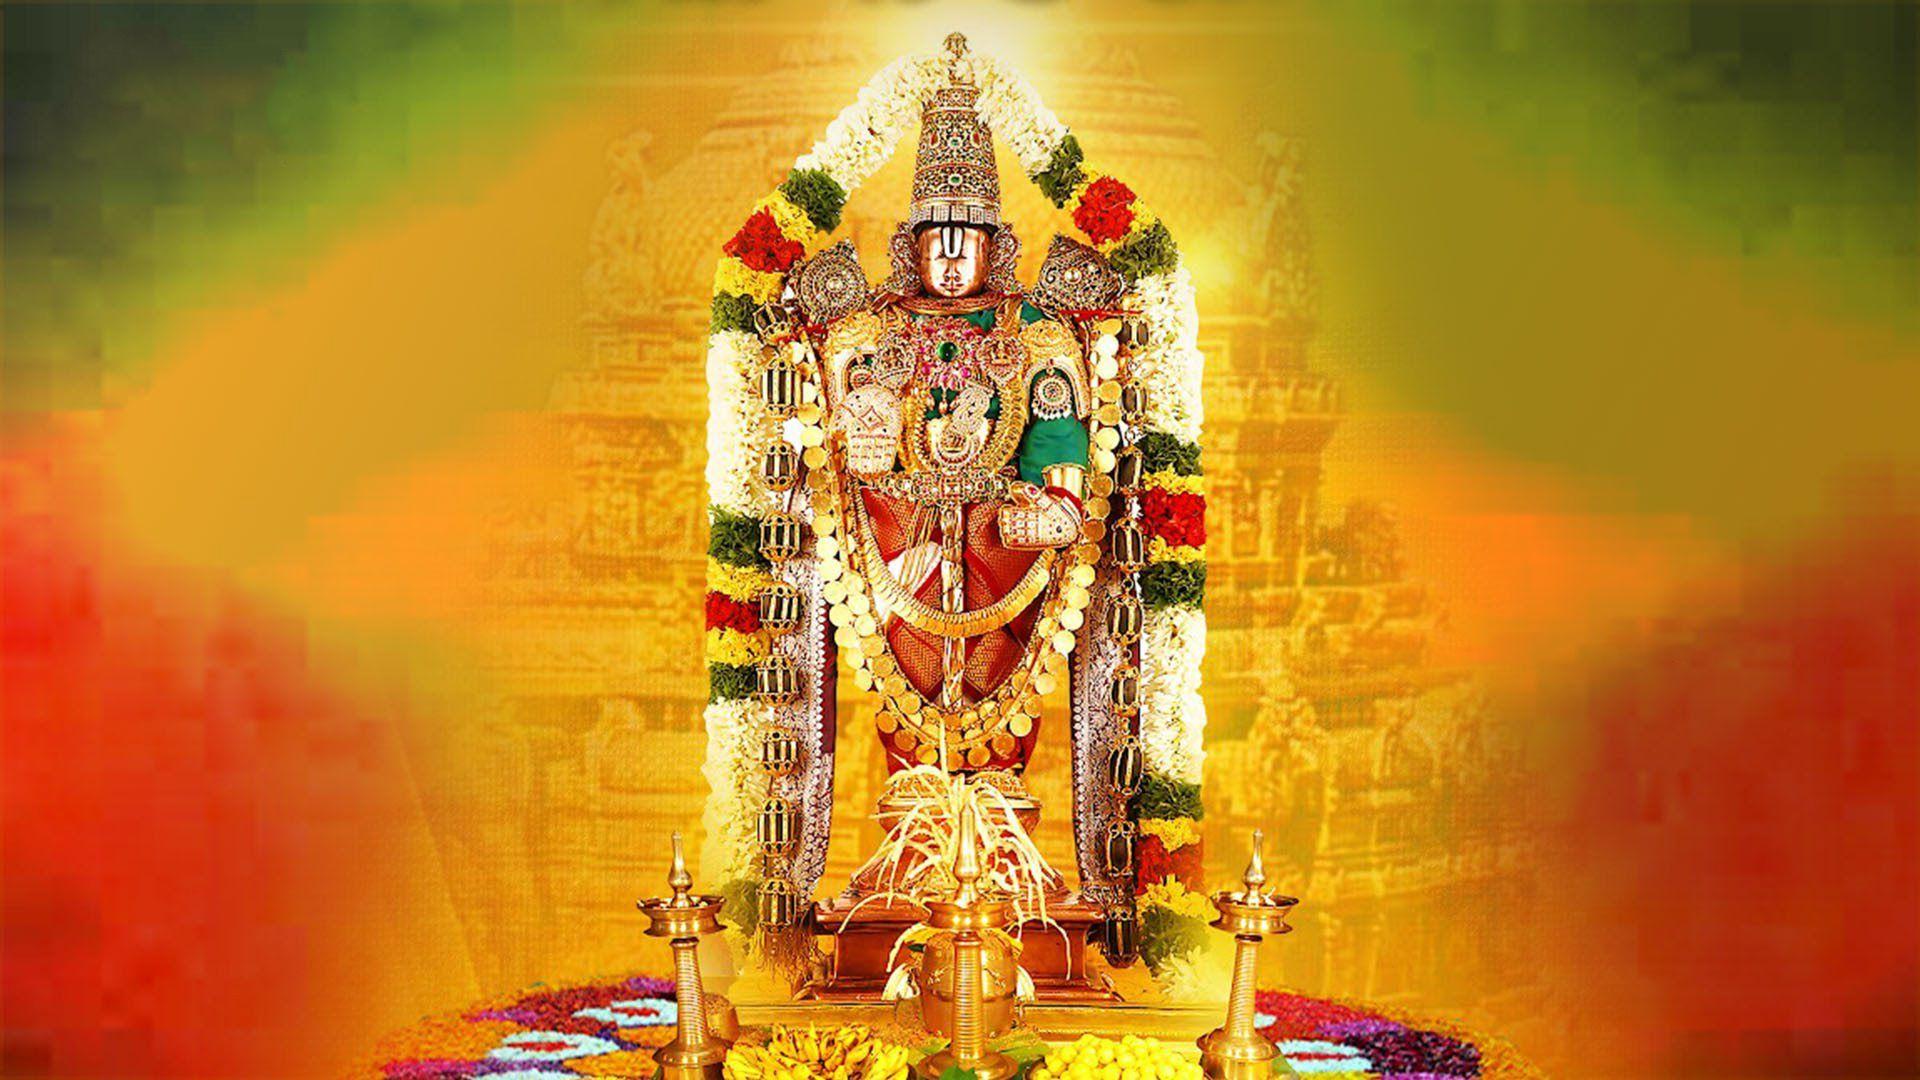 3d Wallpapers Of Lord Venkateswara 241981 3d Wallpaper Wallpaper Ganesha Painting